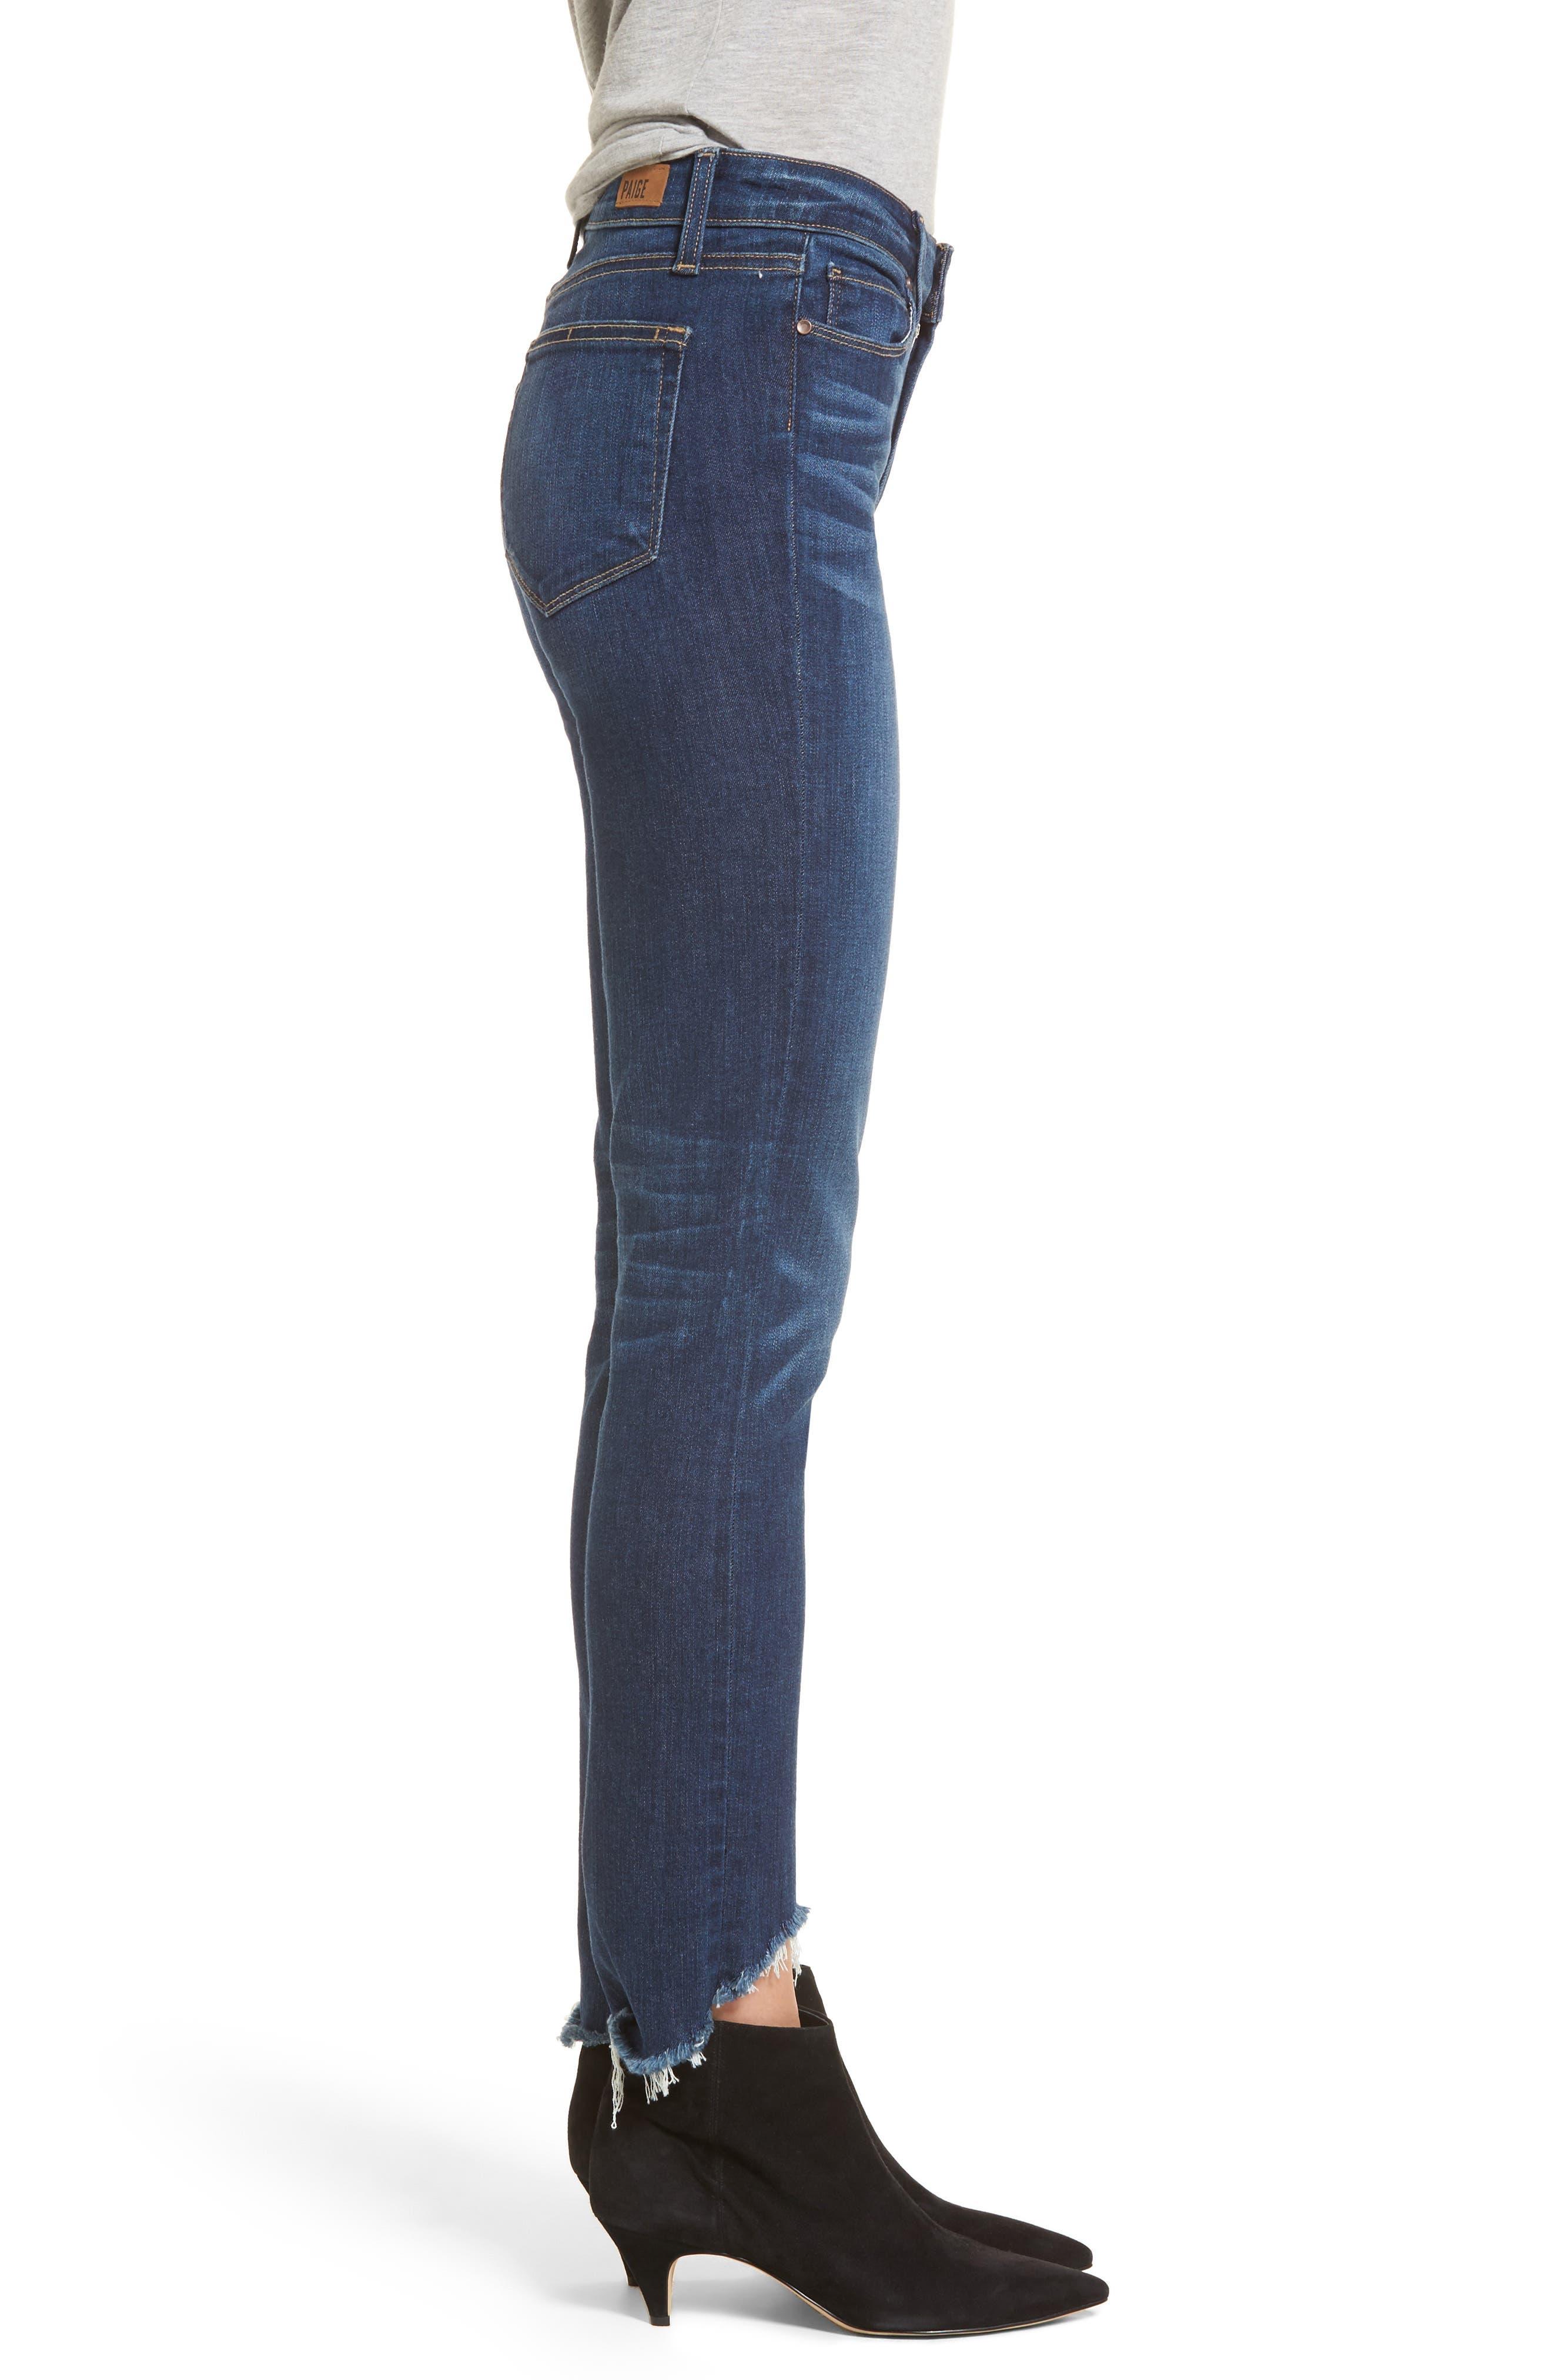 Transcend Vintage - Hoxton High Waist Ankle Skinny Jeans,                             Alternate thumbnail 3, color,